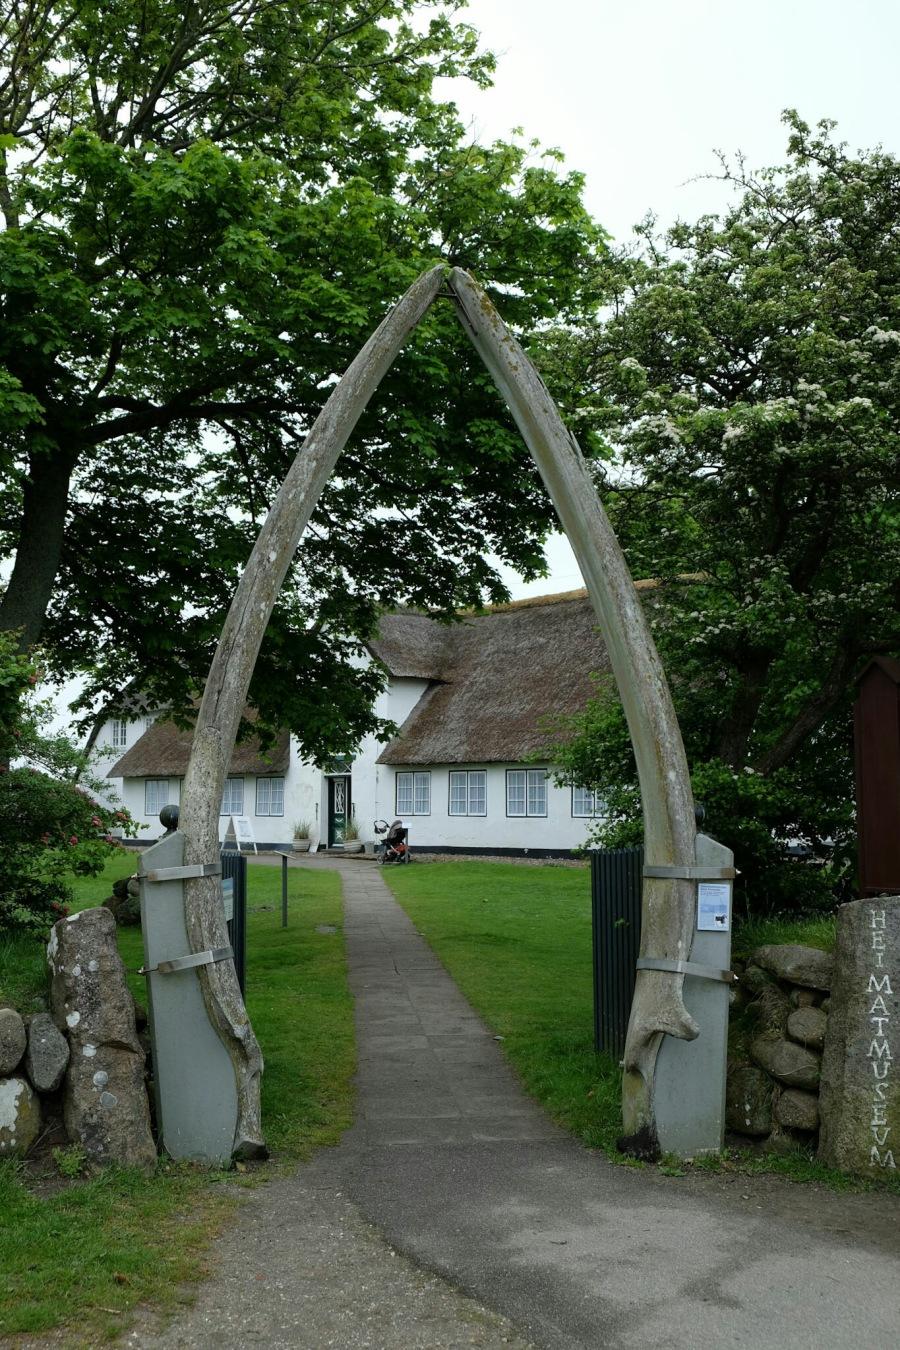 Eingang des Sylter Heimatmuseums (mit Walfischknochen)